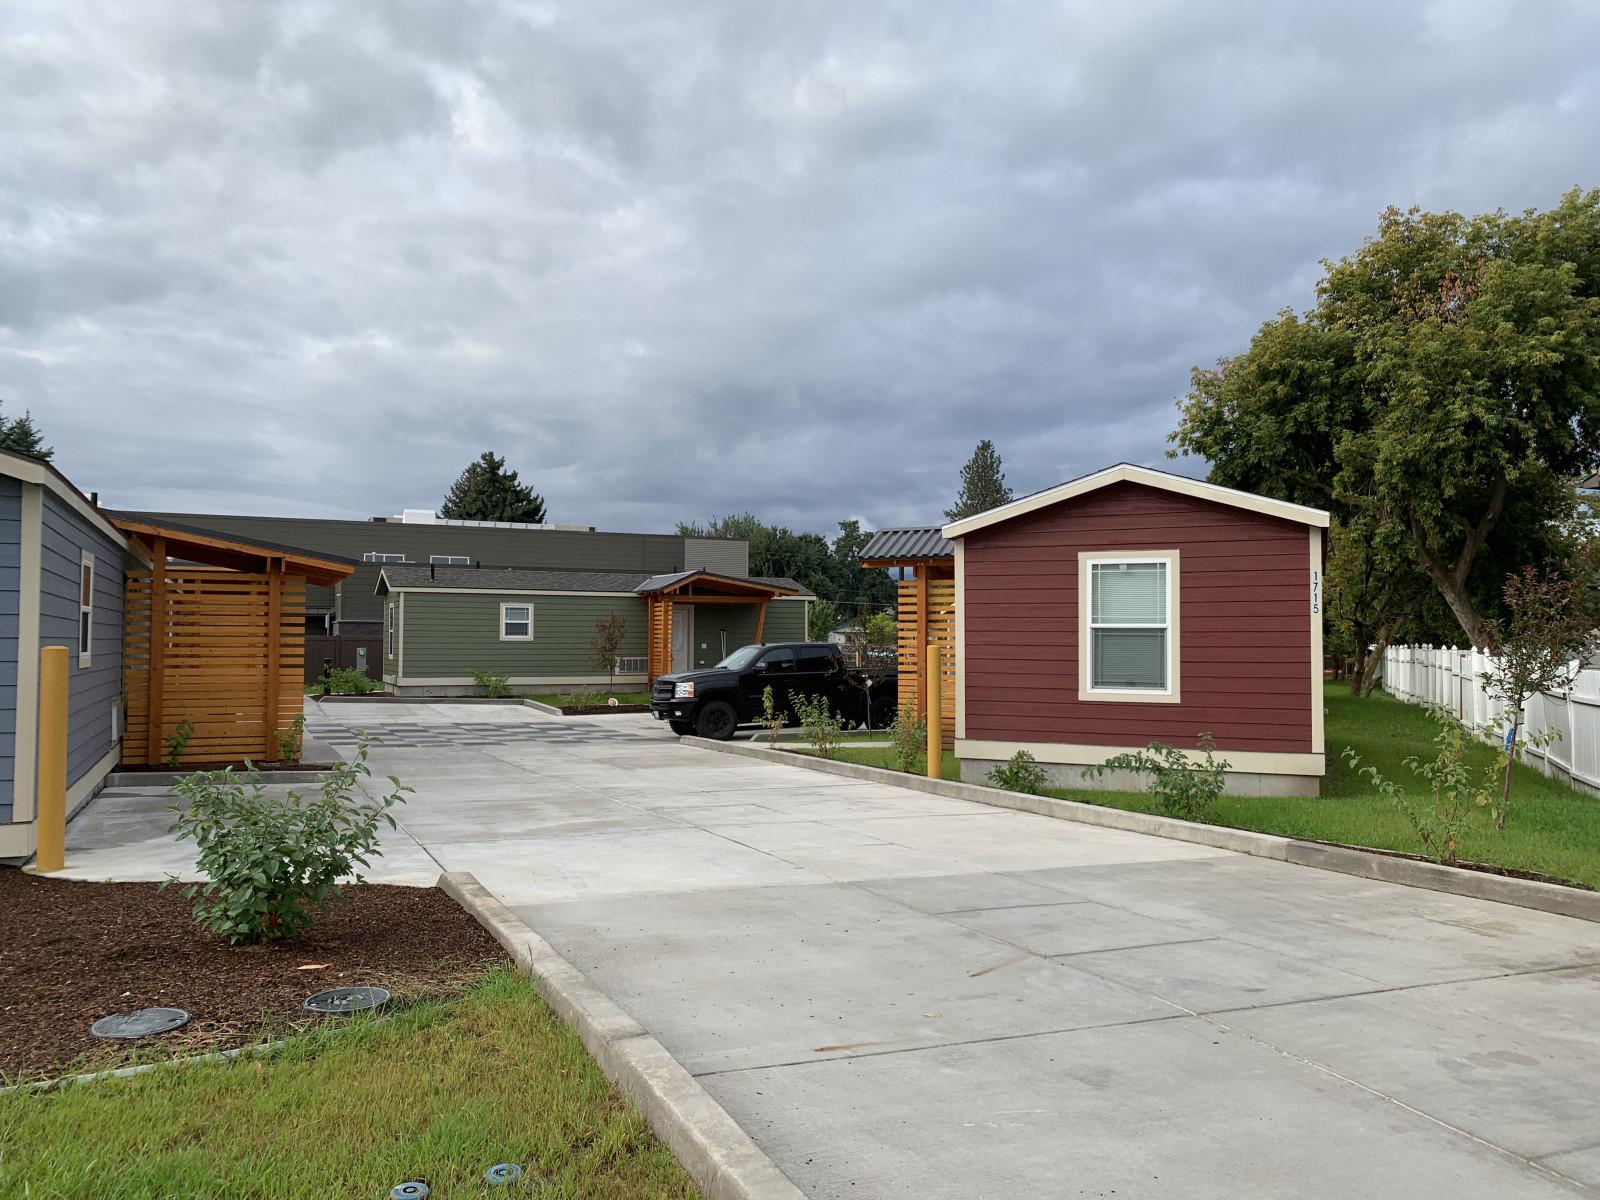 Montana Street Homes